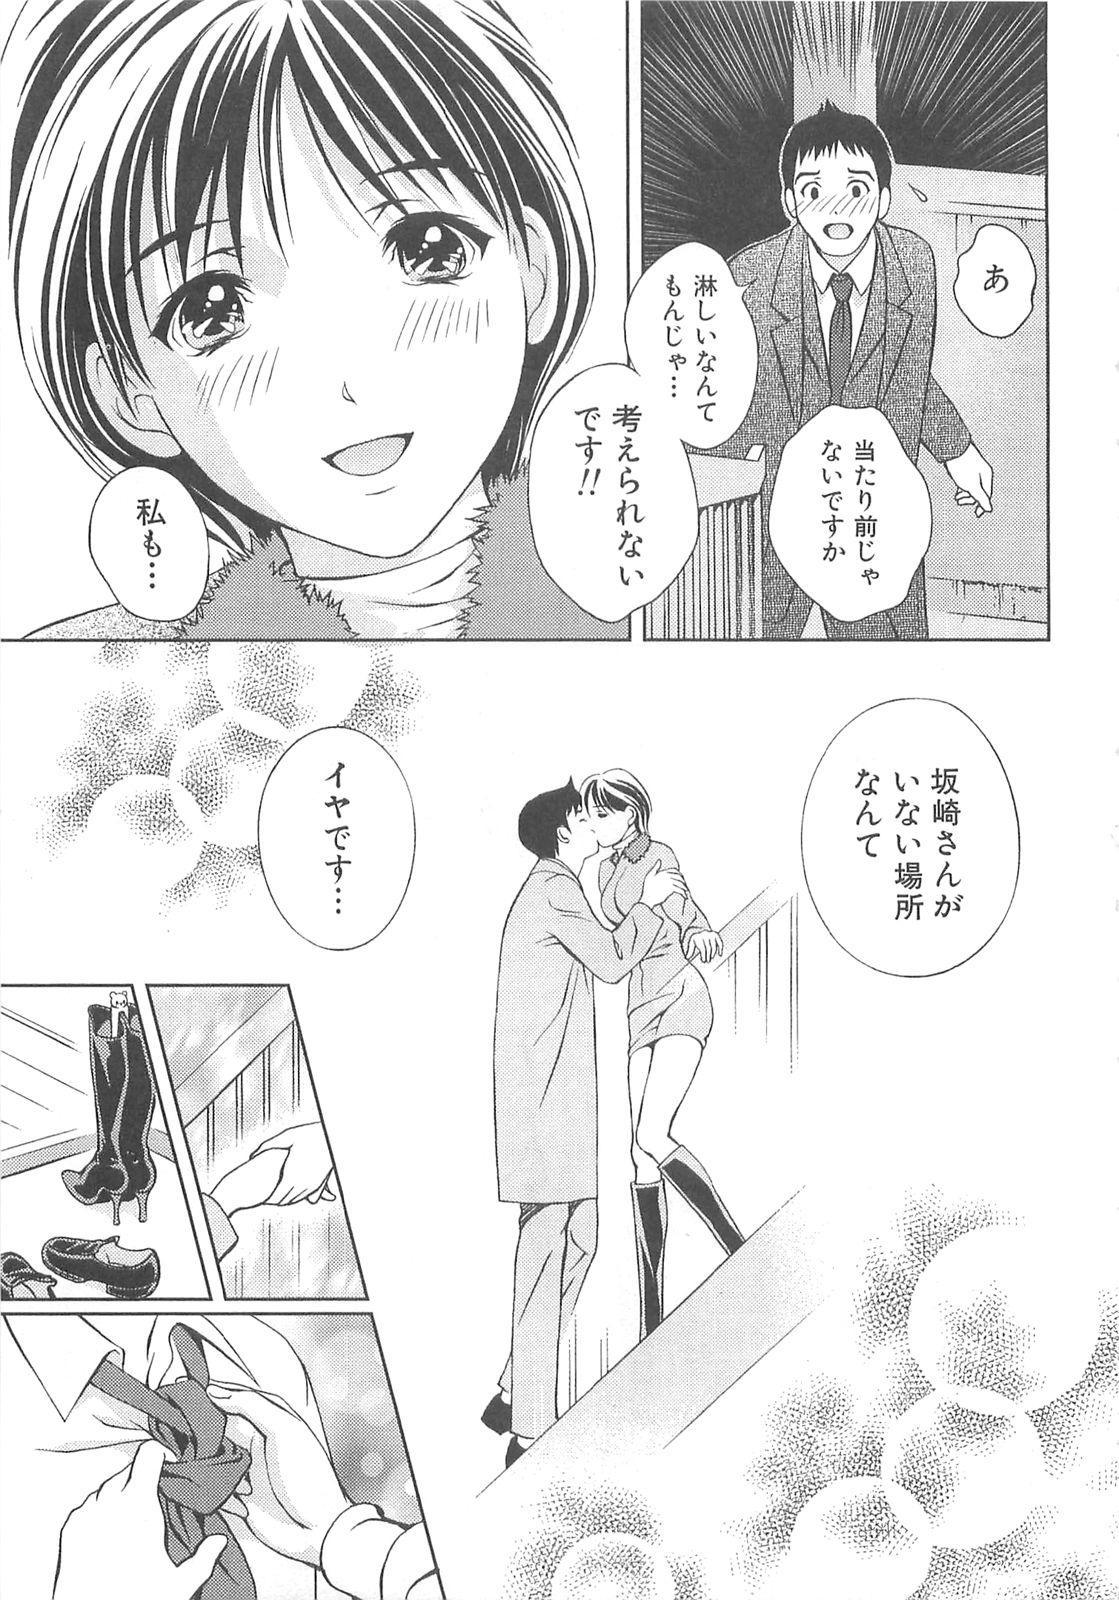 Tenshi no Kyuu - Angel's Pretty Hip 37